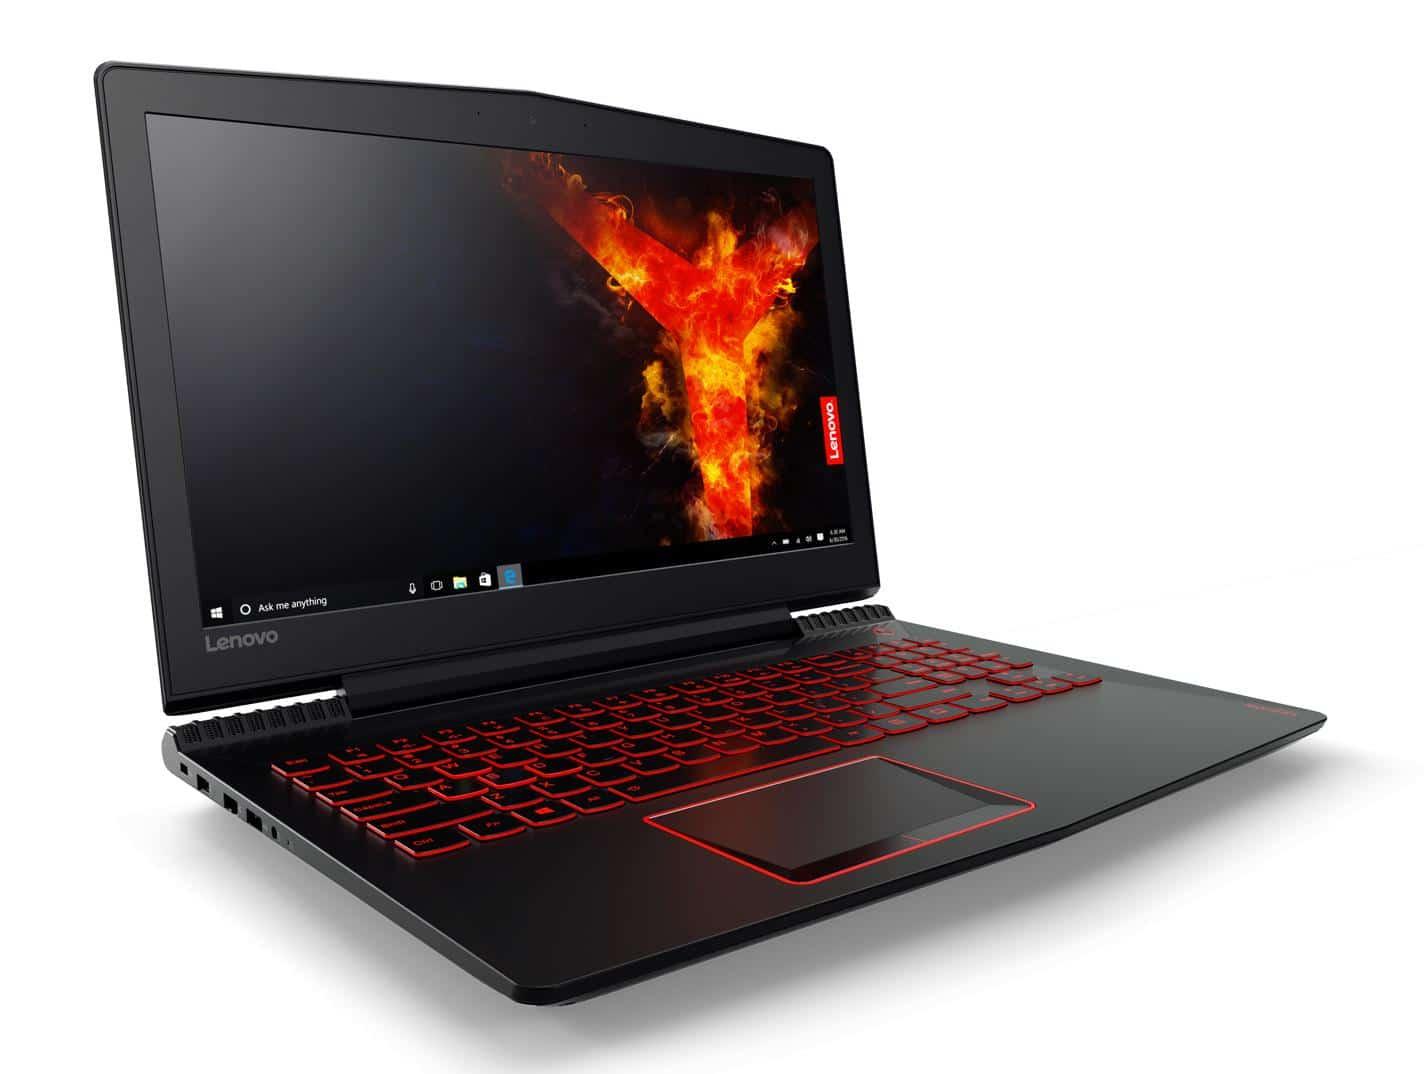 Lenovo Legion Y520-15IKBN, PC 15 pouces Full IPS i7 GTX 1050 SSD (899€)